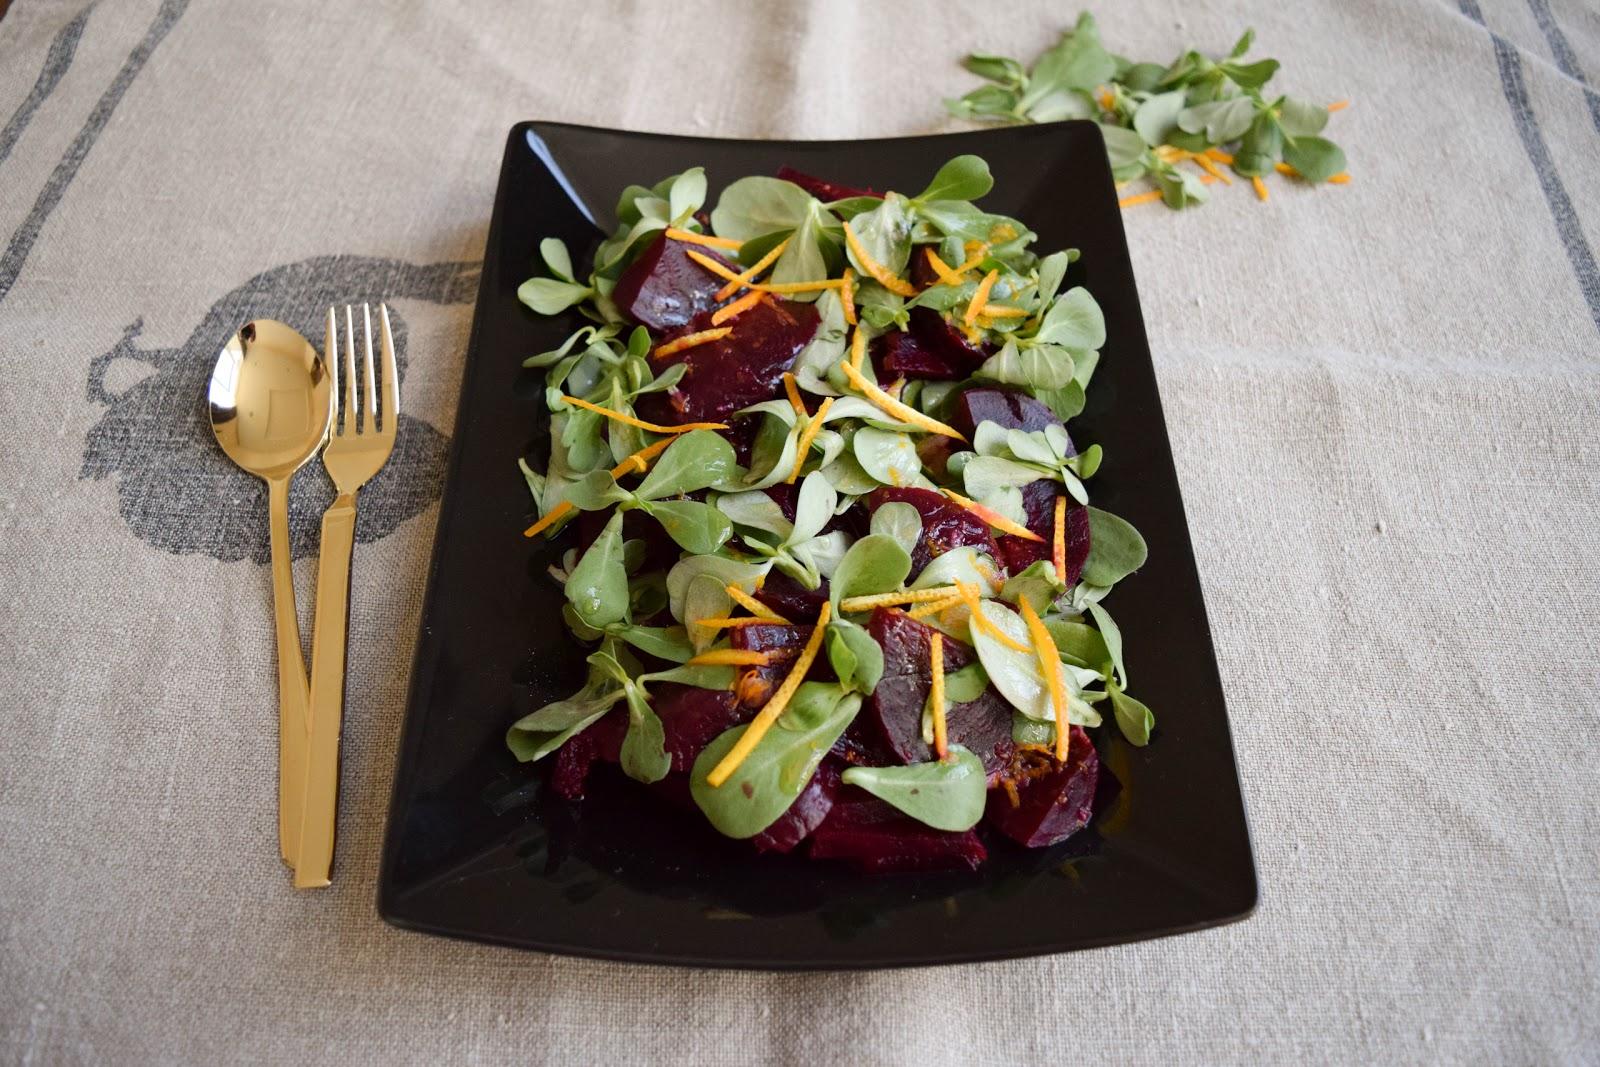 Beetroot and purslane salad with orange dressing